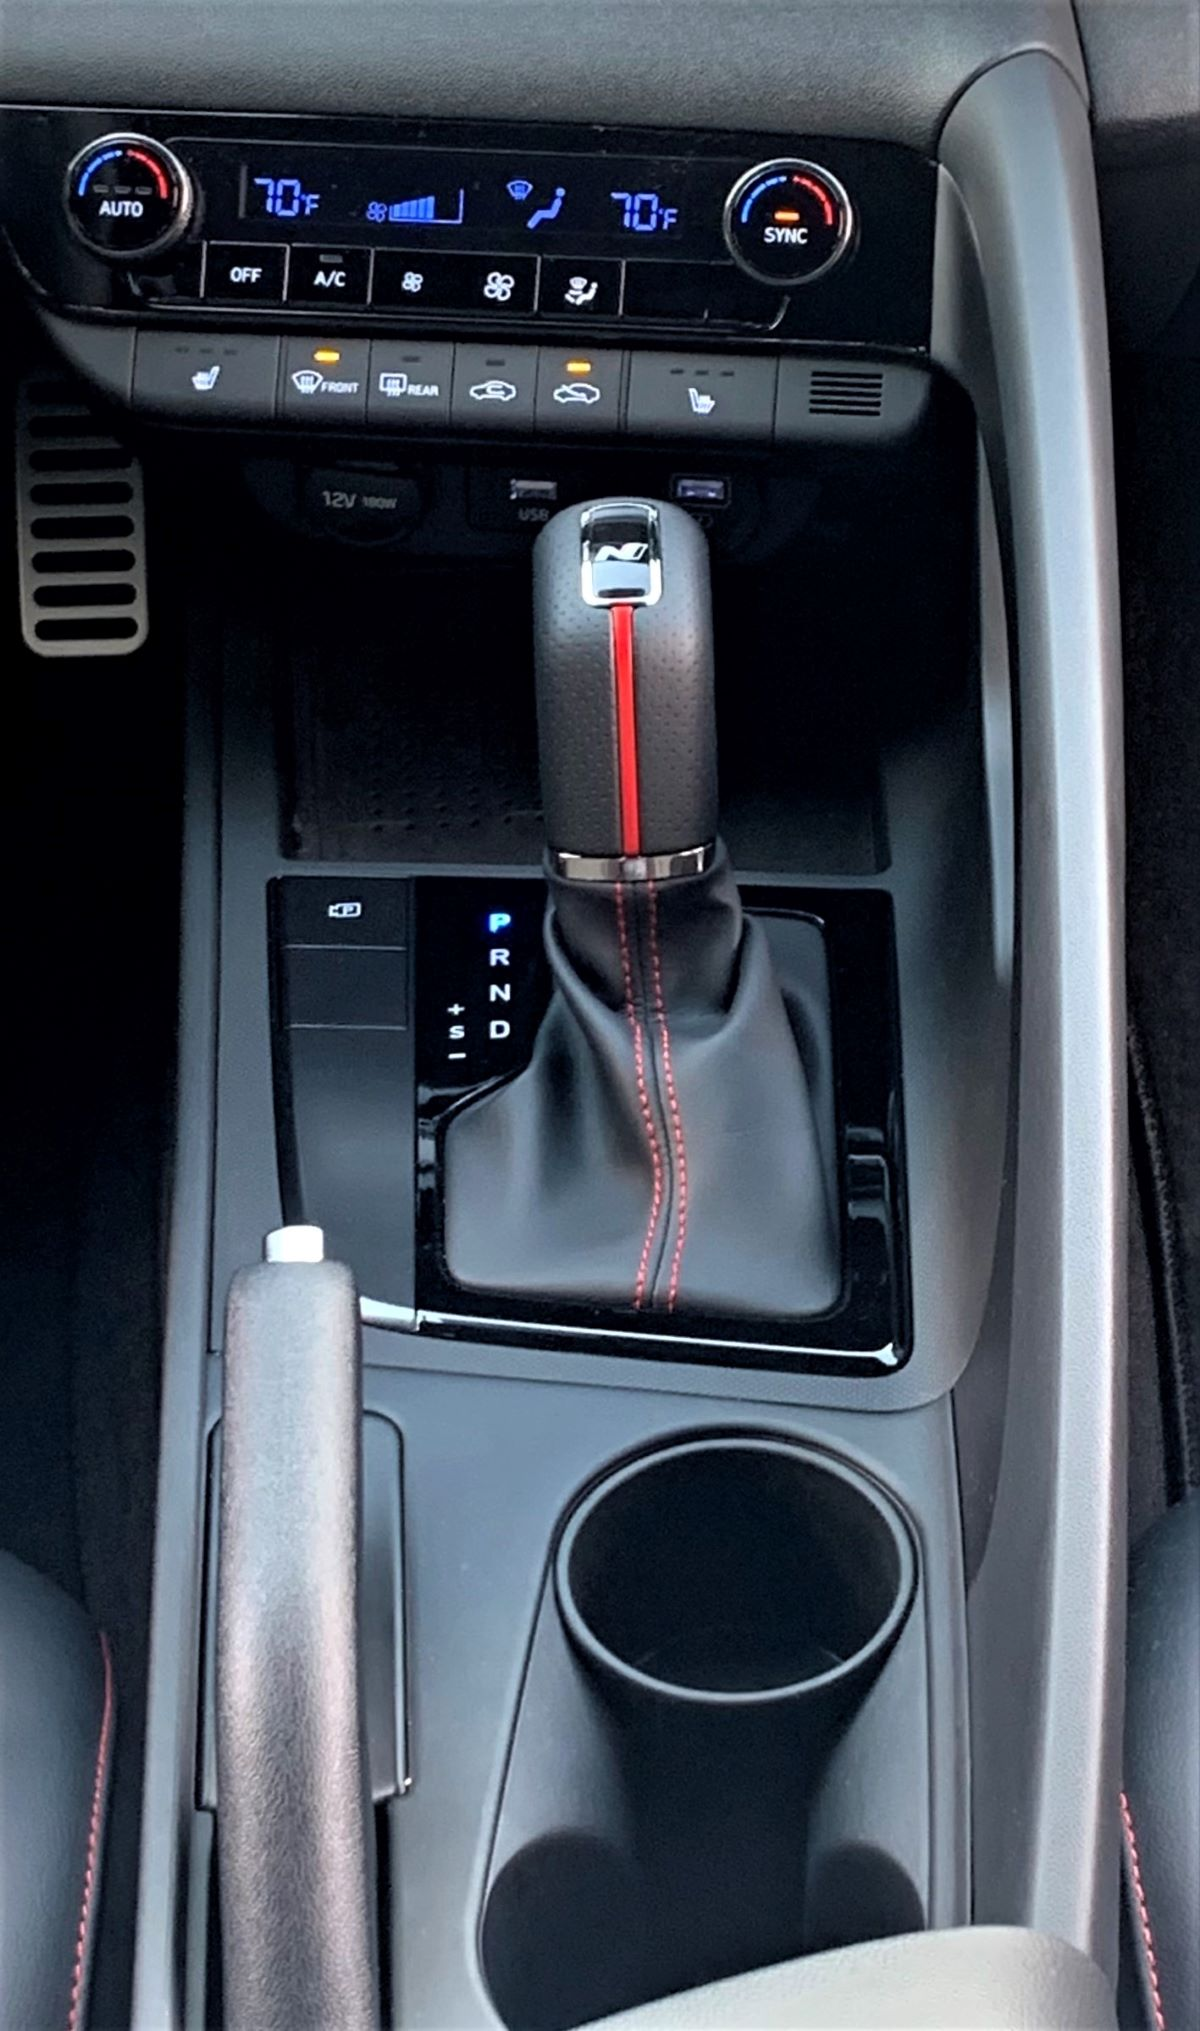 2021 Hyundai Elantra N Line DCT shifter